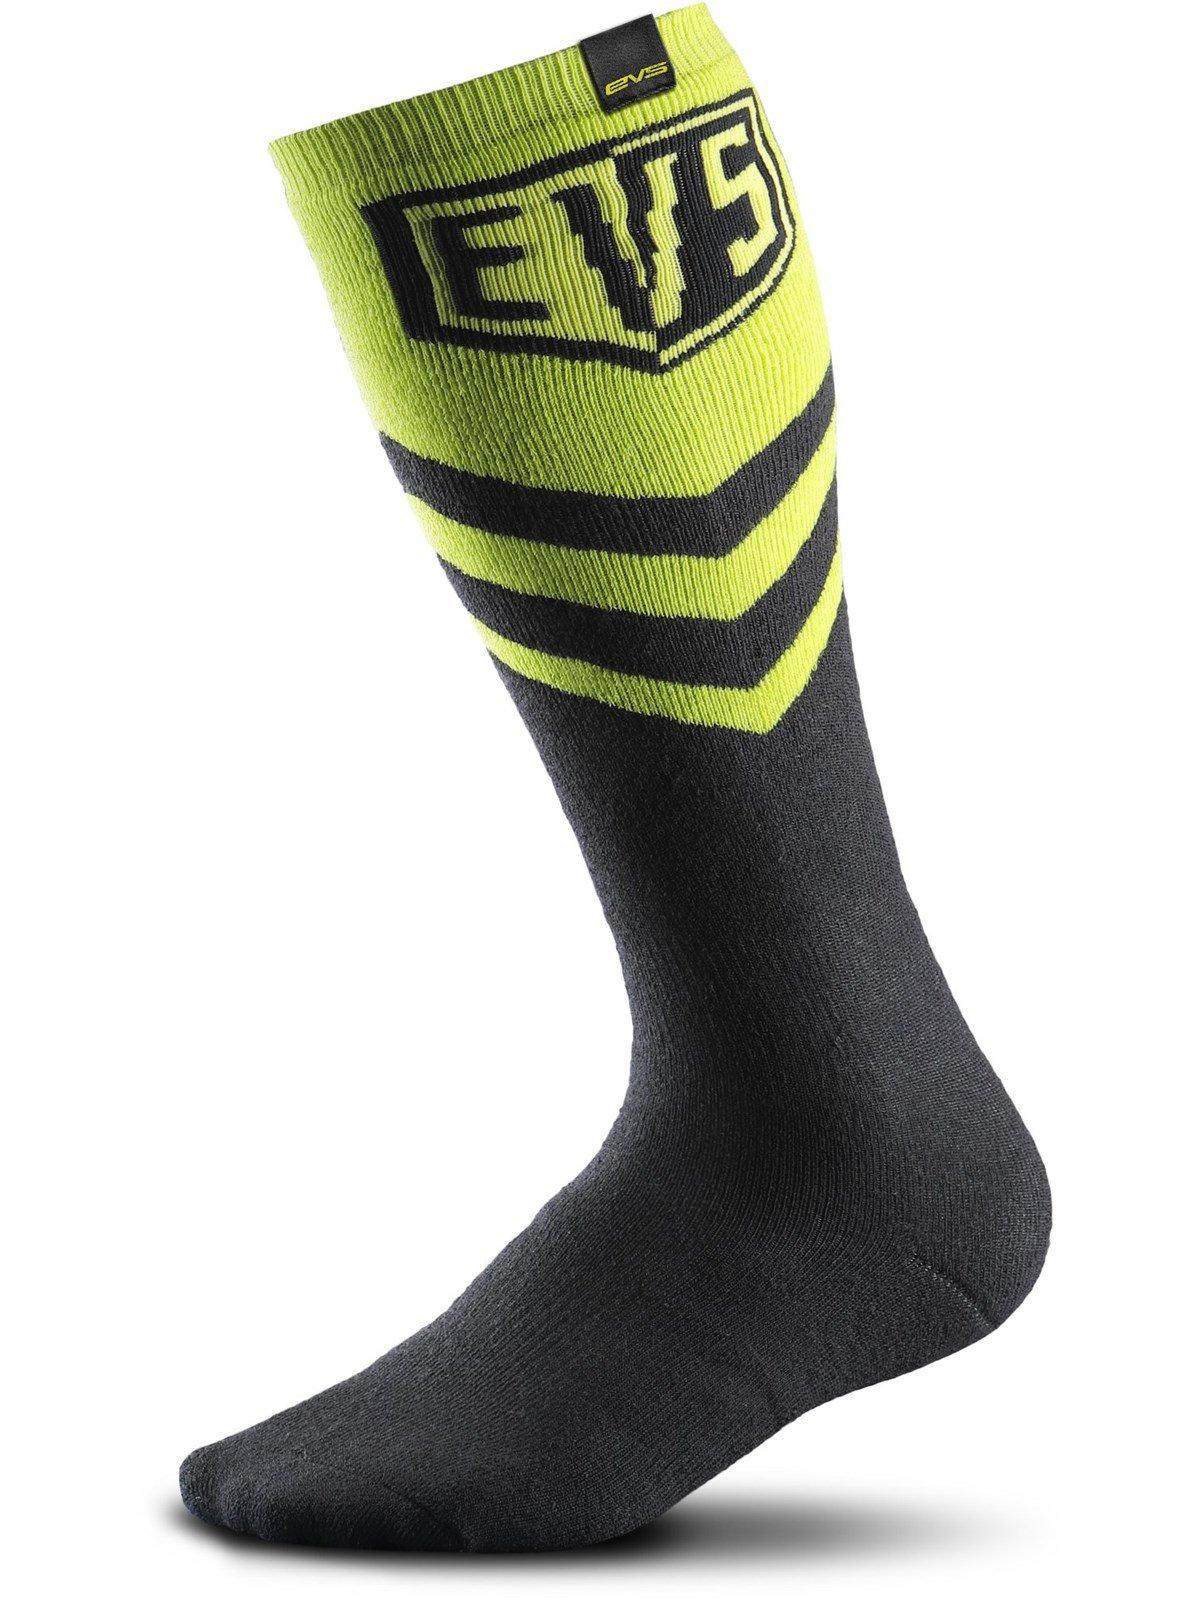 EVS Sports unisex-adult Coolmax Moto Sock (Hi-Viz Yellow, Large), 1 Pack